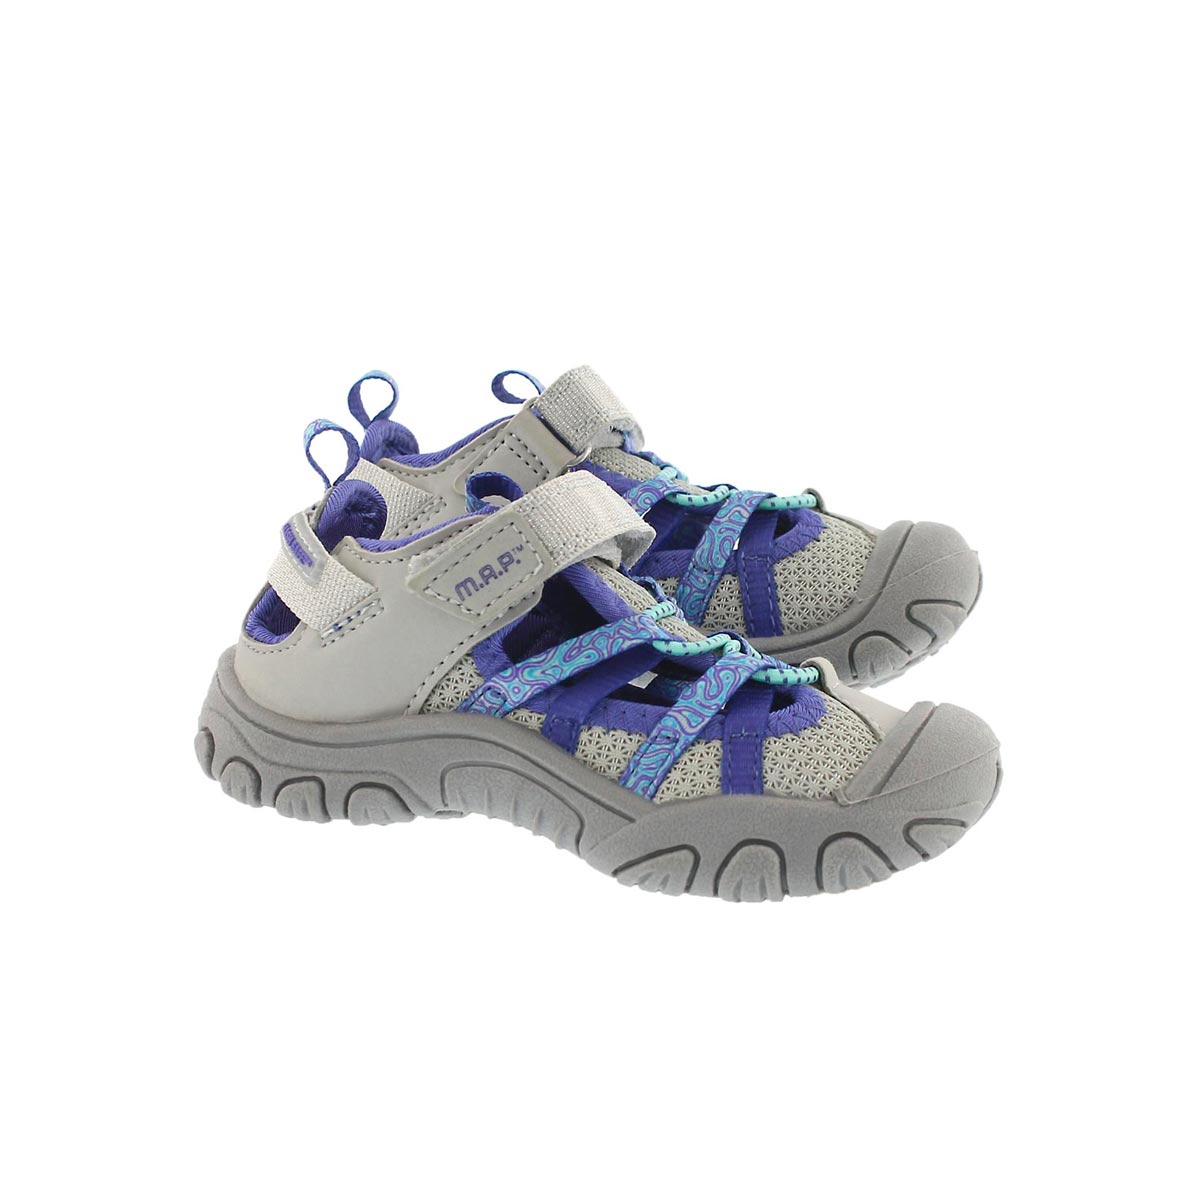 Inf-g Niagara slvr/ppl fisherman sandal